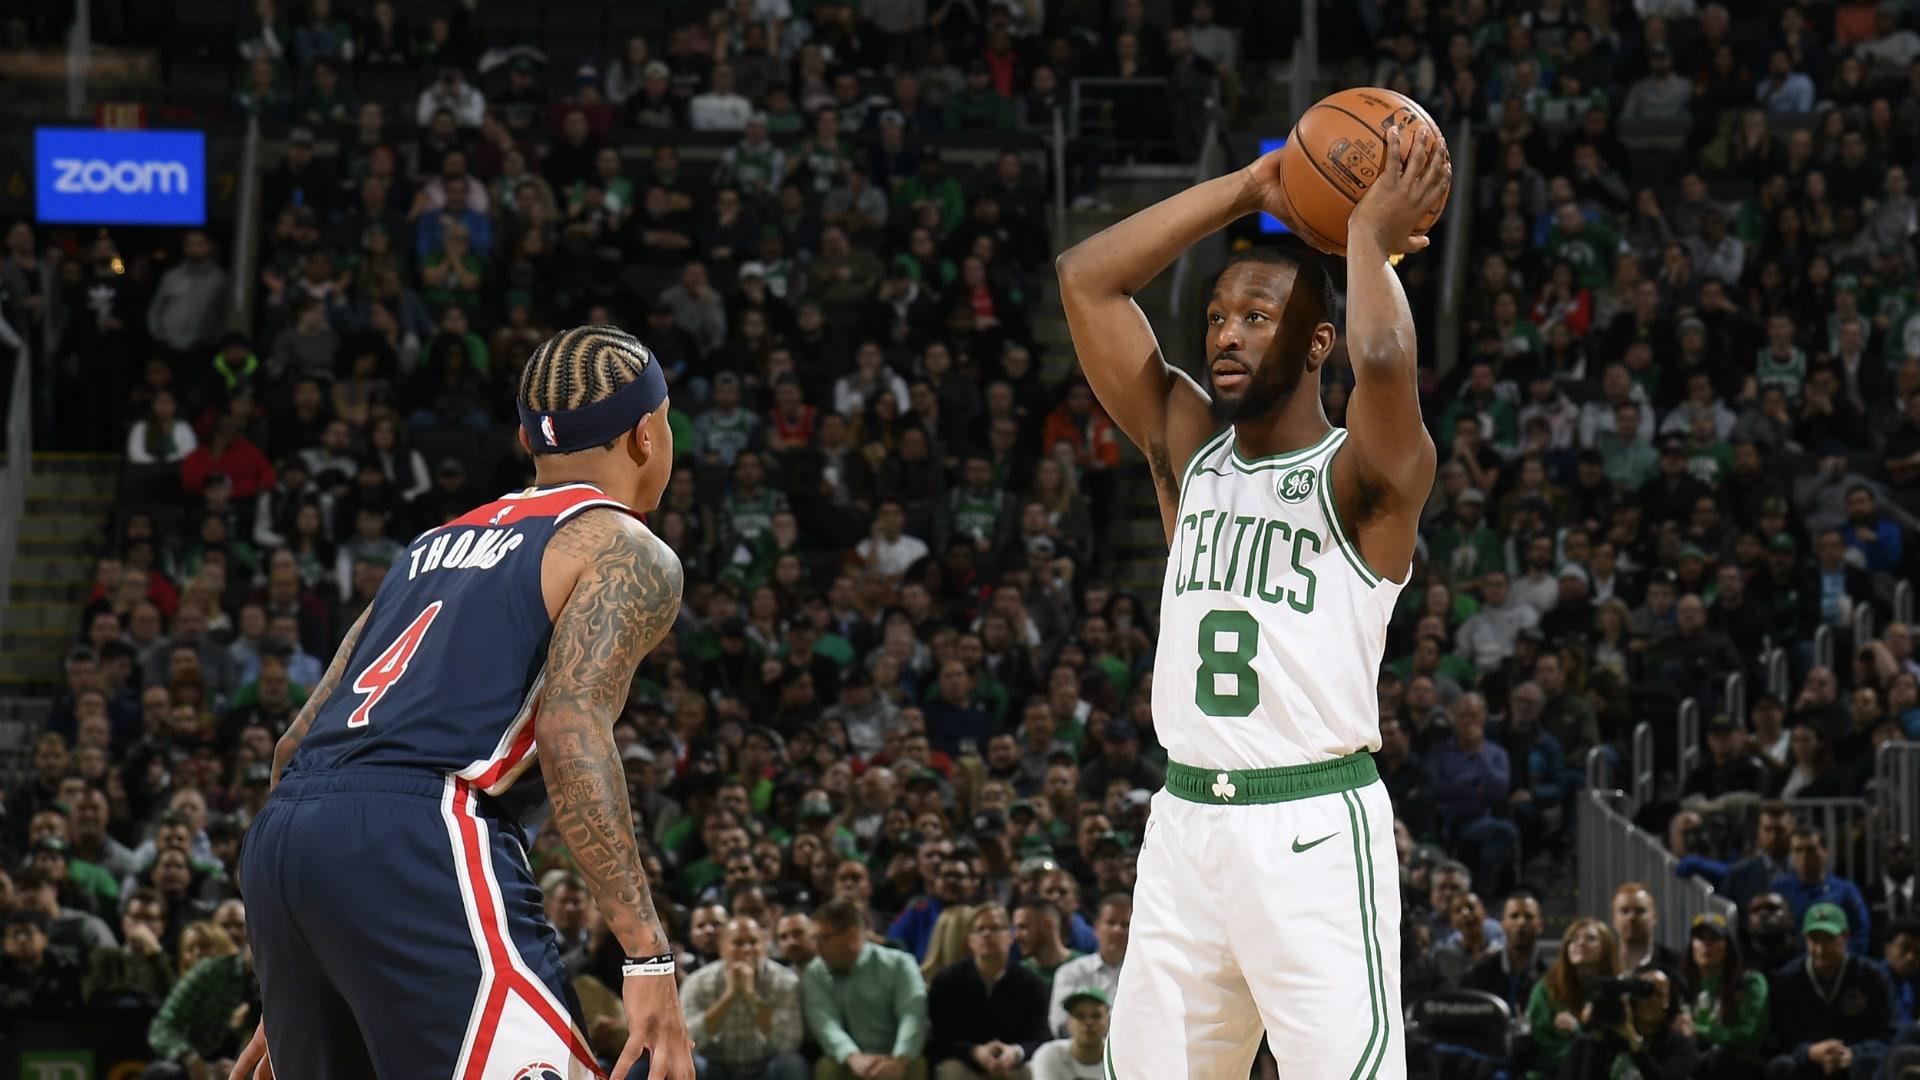 Wizards @ Celtics